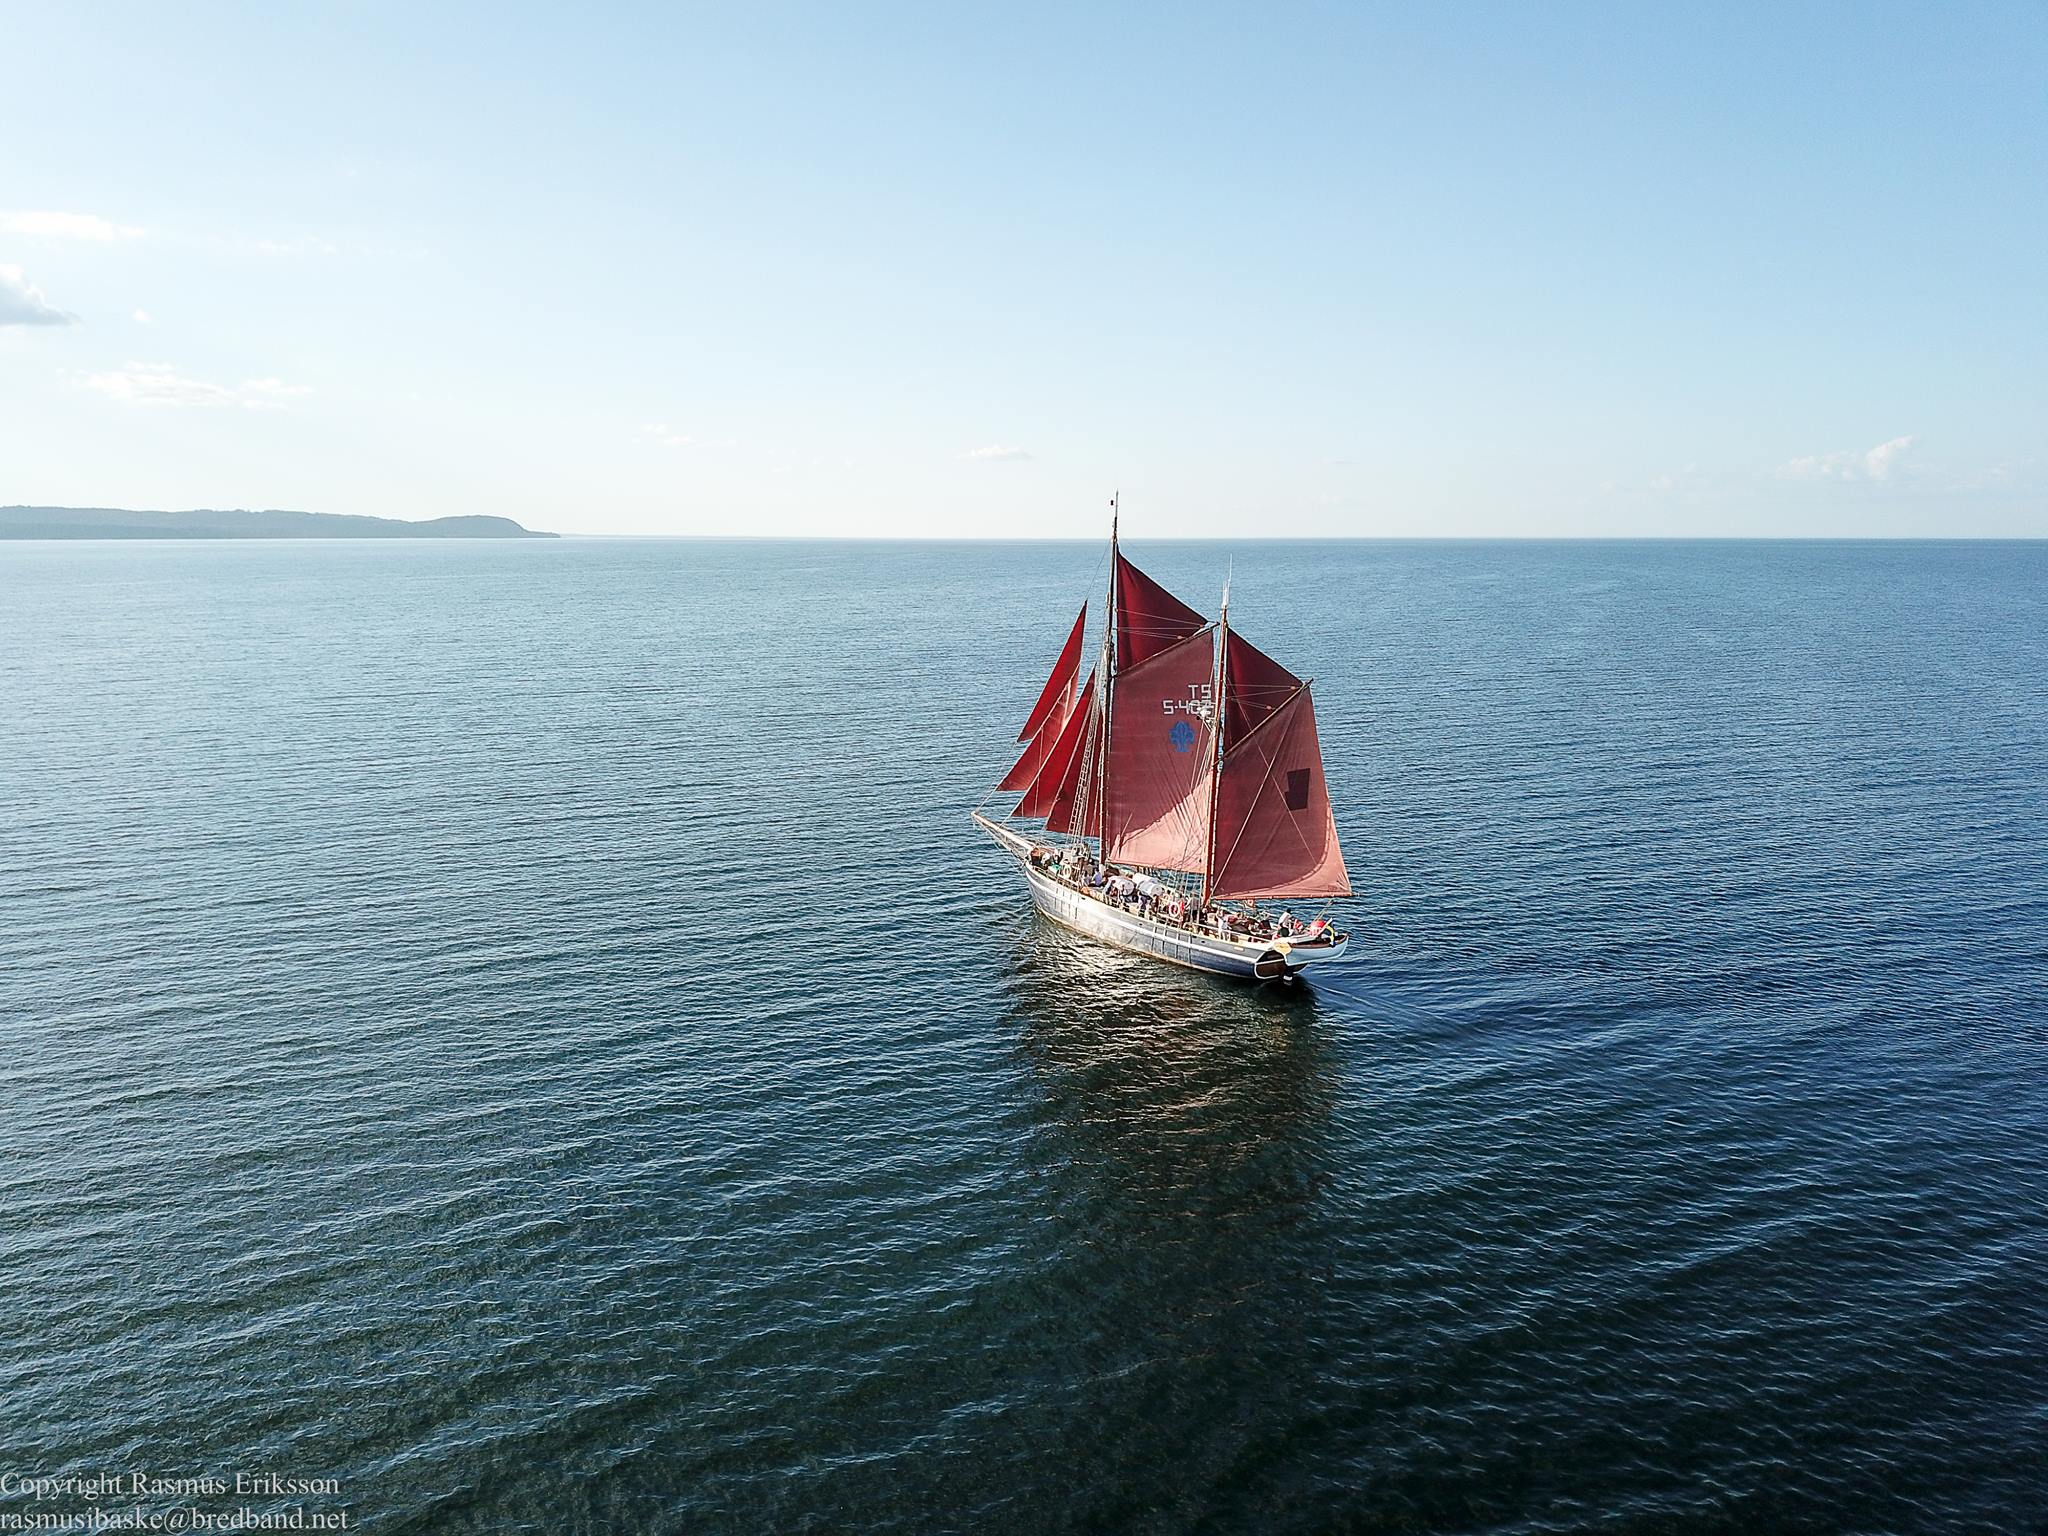 Pirate sailing - sarpen's sailing schedule 2021